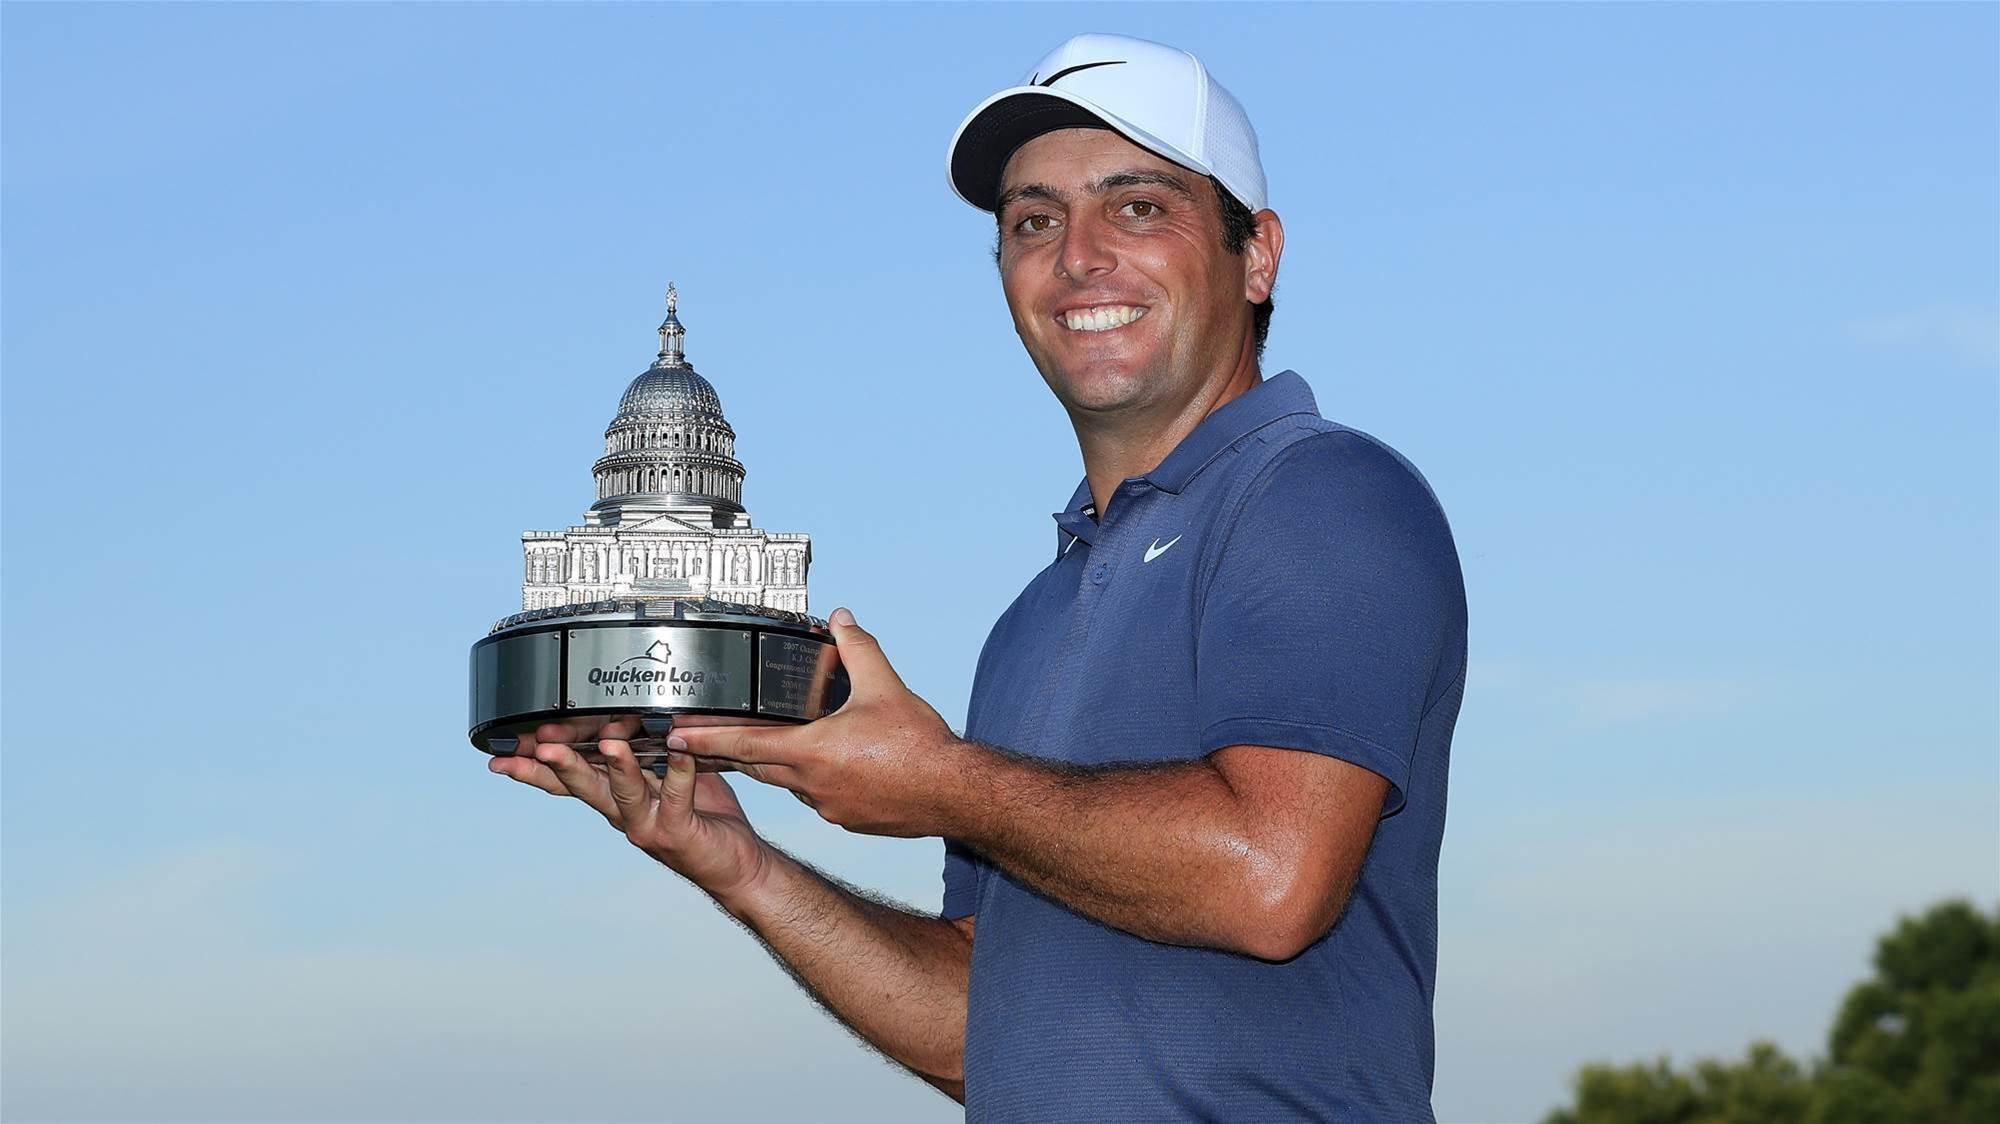 Molinari storms to maiden PGA Tour victory